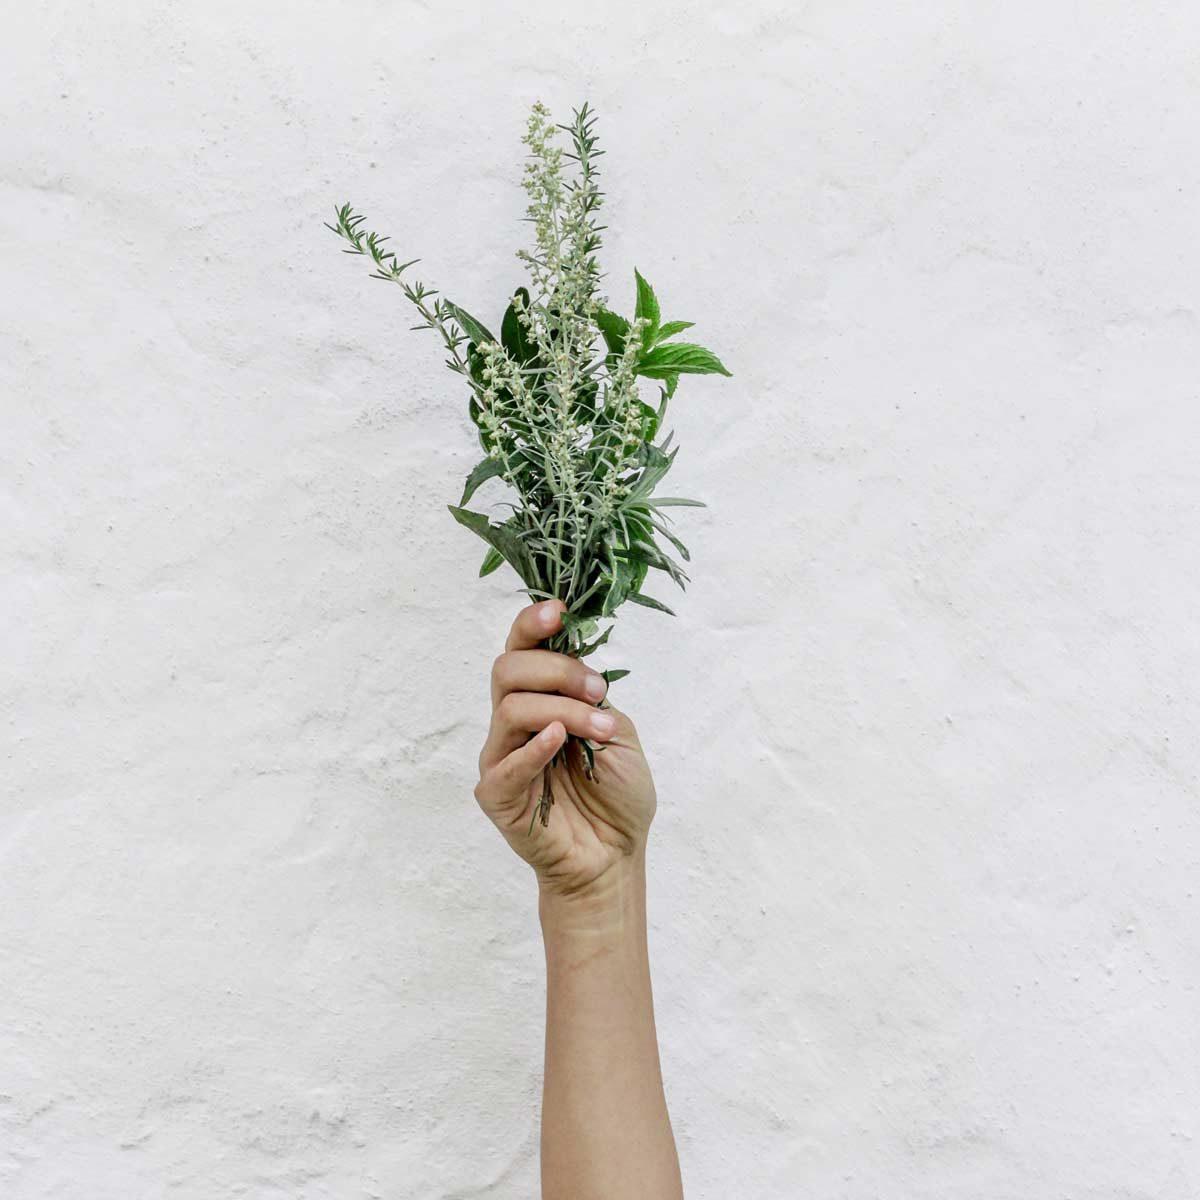 herbal-medicine-in-hand